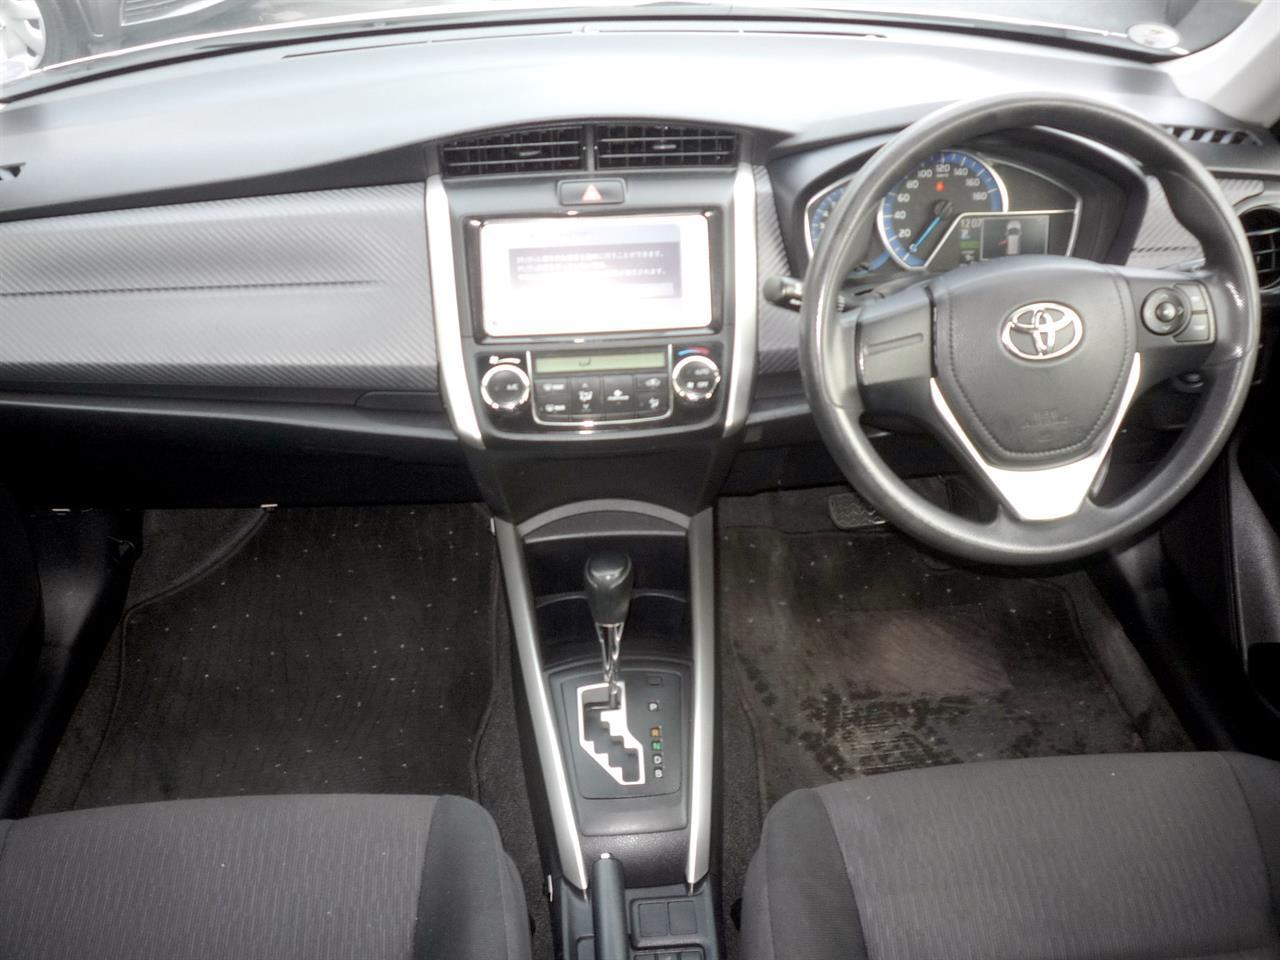 image-2, 2013 Toyota Corolla Fielder Hybrid at Dunedin